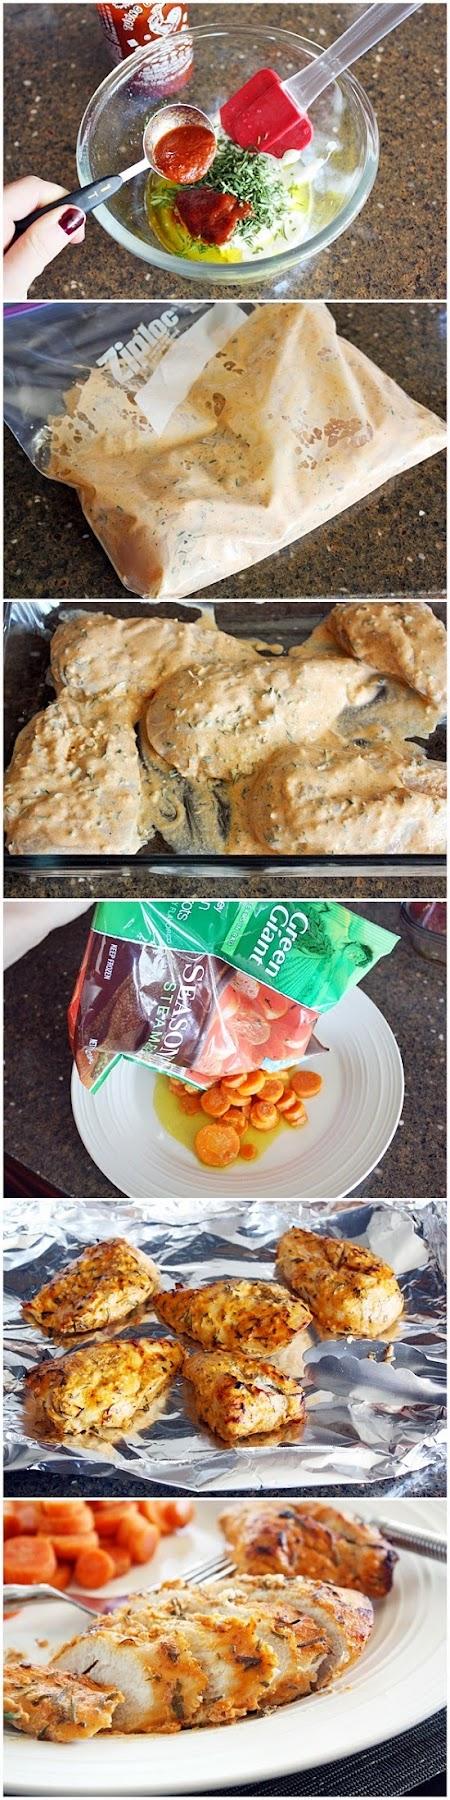 How To Make Crispy Sriracha Chicken